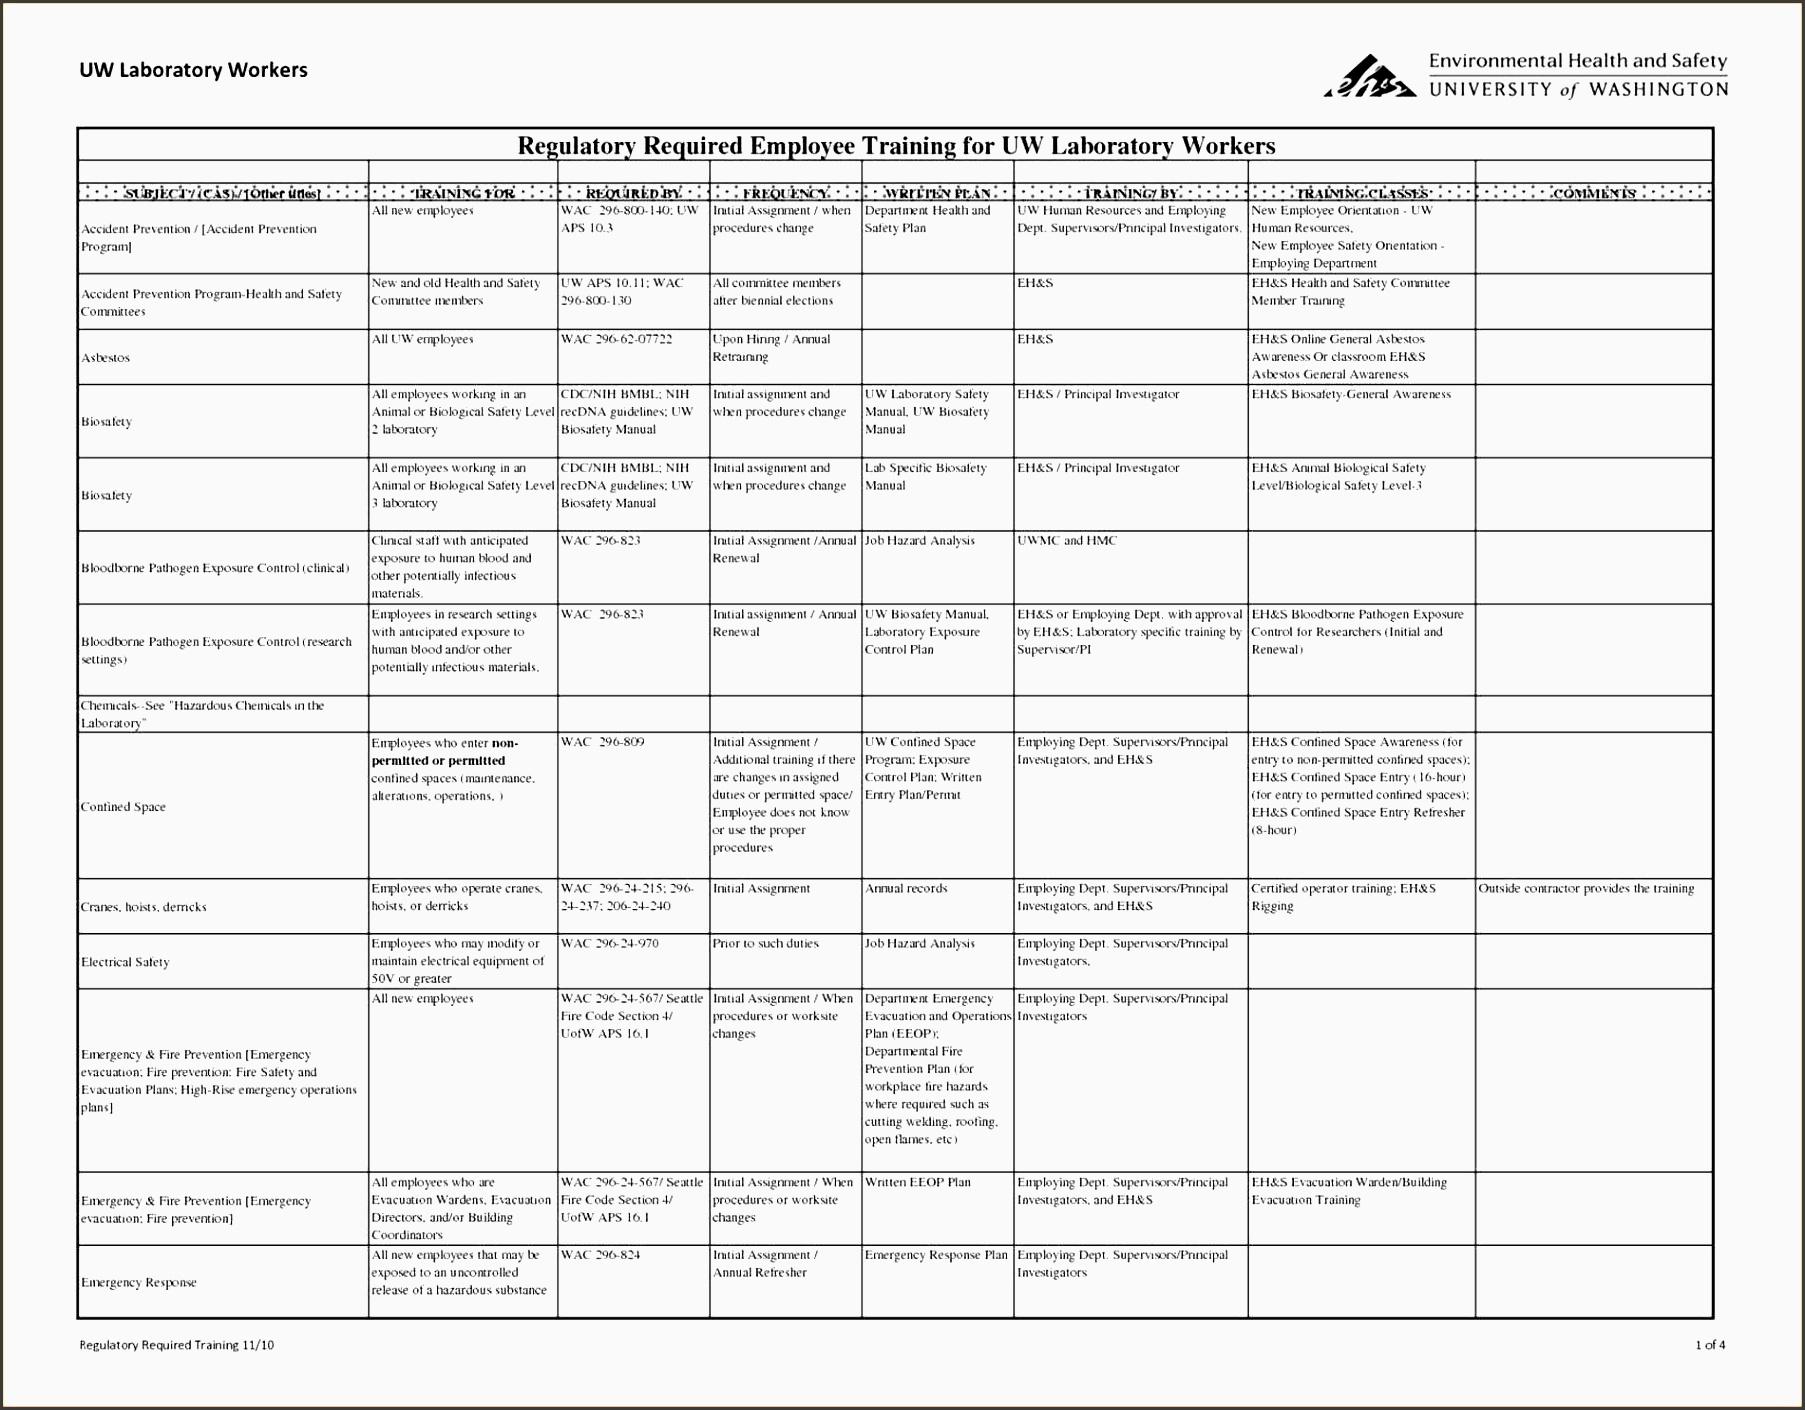 employee training plan template business 5 paragraph essay writing schedule templatememo templates word memo training training